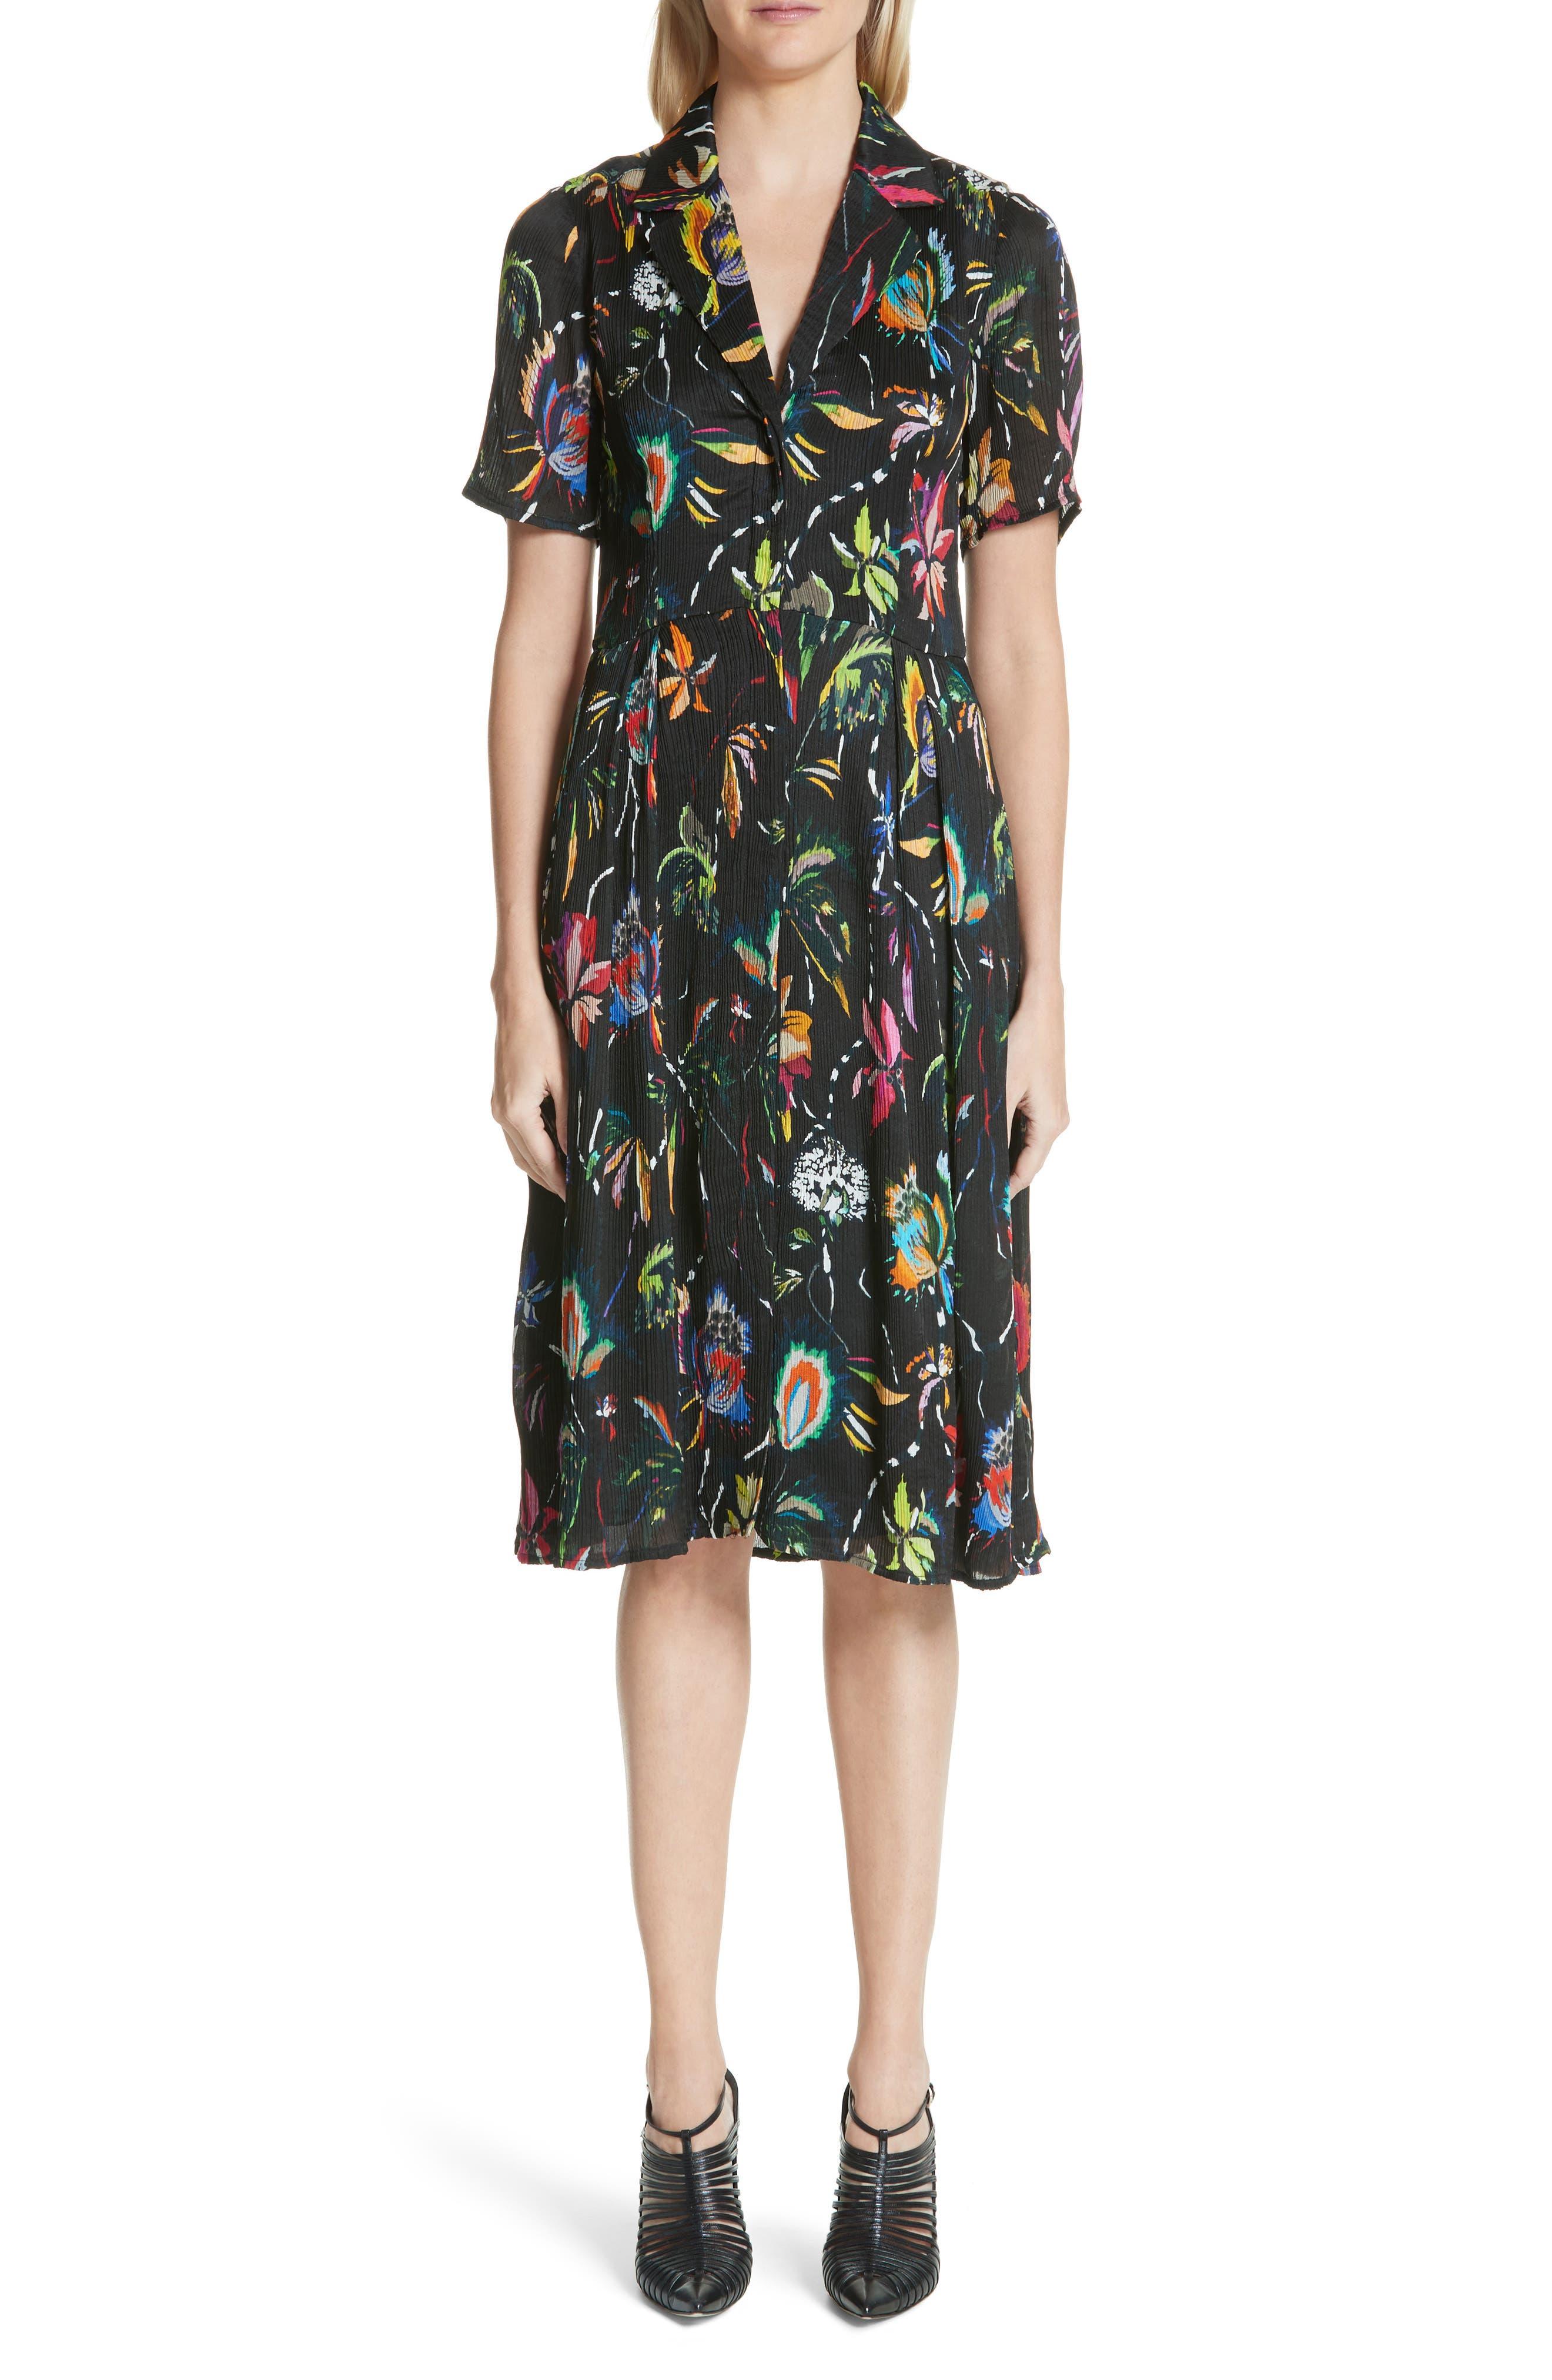 Alternate Image 1 Selected - Jason Wu Floral Print Plissé Silk Crepon Dress